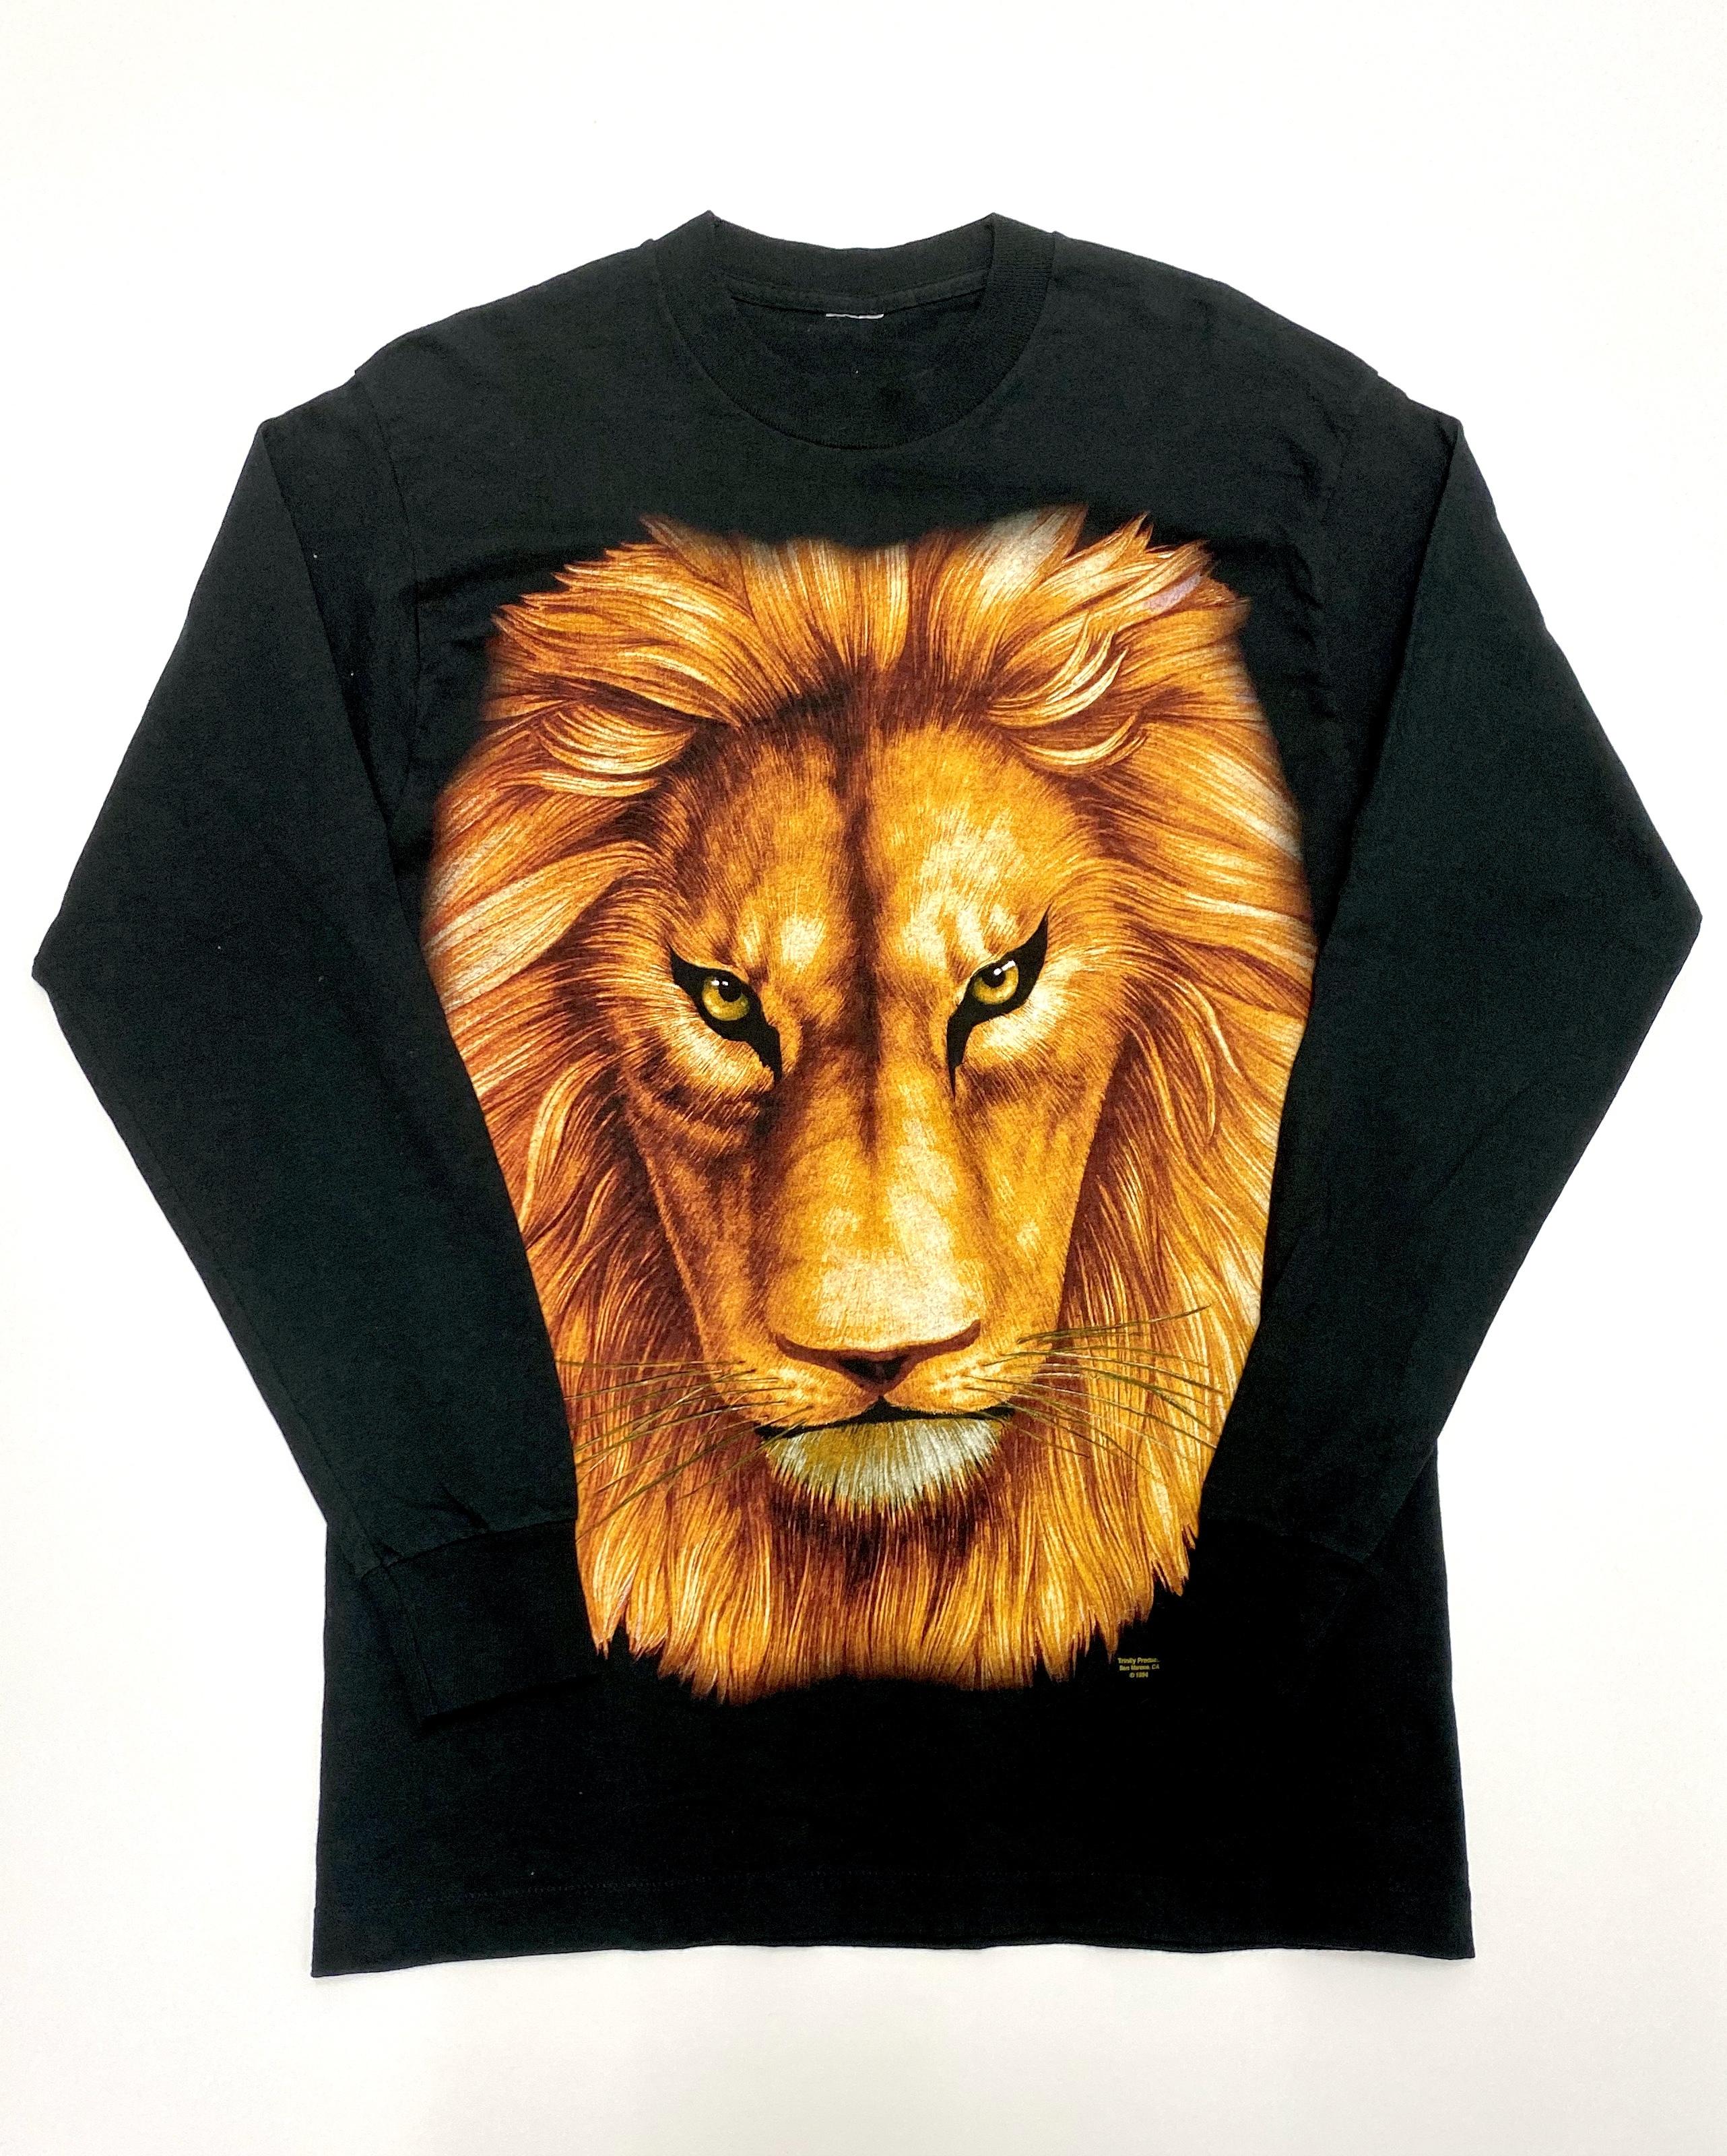 90s  L/S  Lion  T-shirts アニマル ライオン Tシャツ 90年代 XL A787